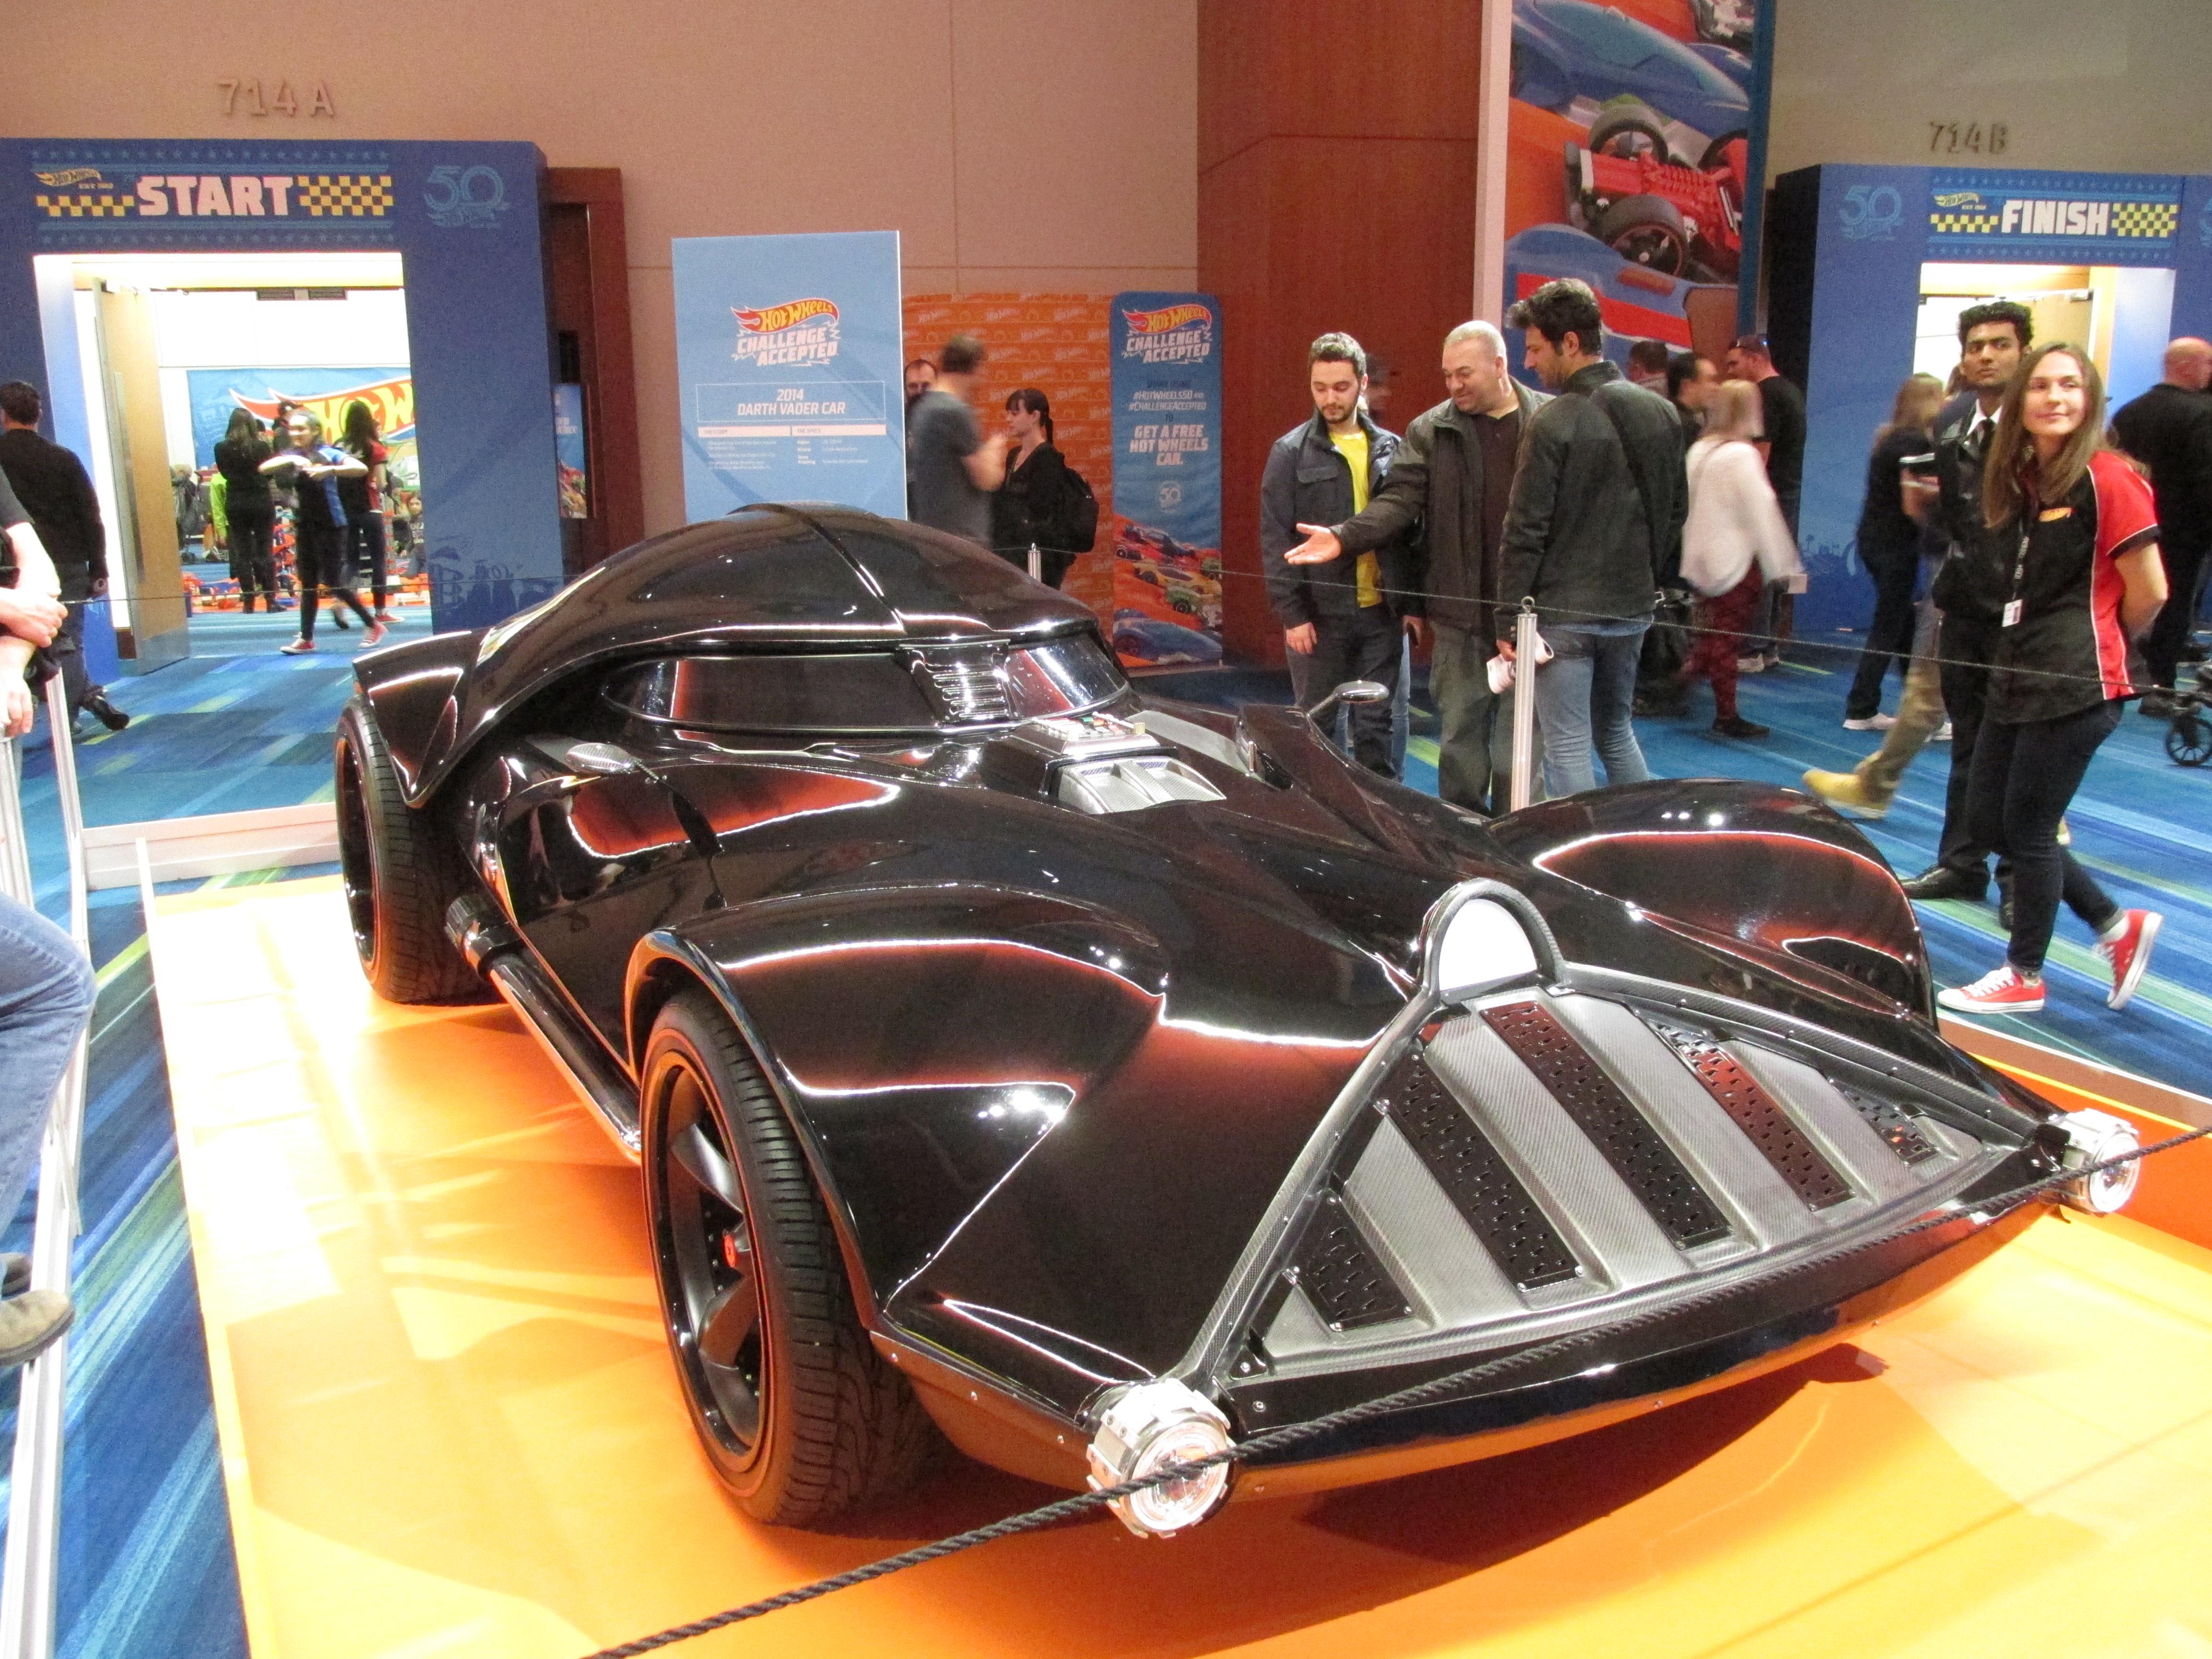 File 2014 Darth Vader Hot Wheels Car 02 Jpg Wikimedia Commons